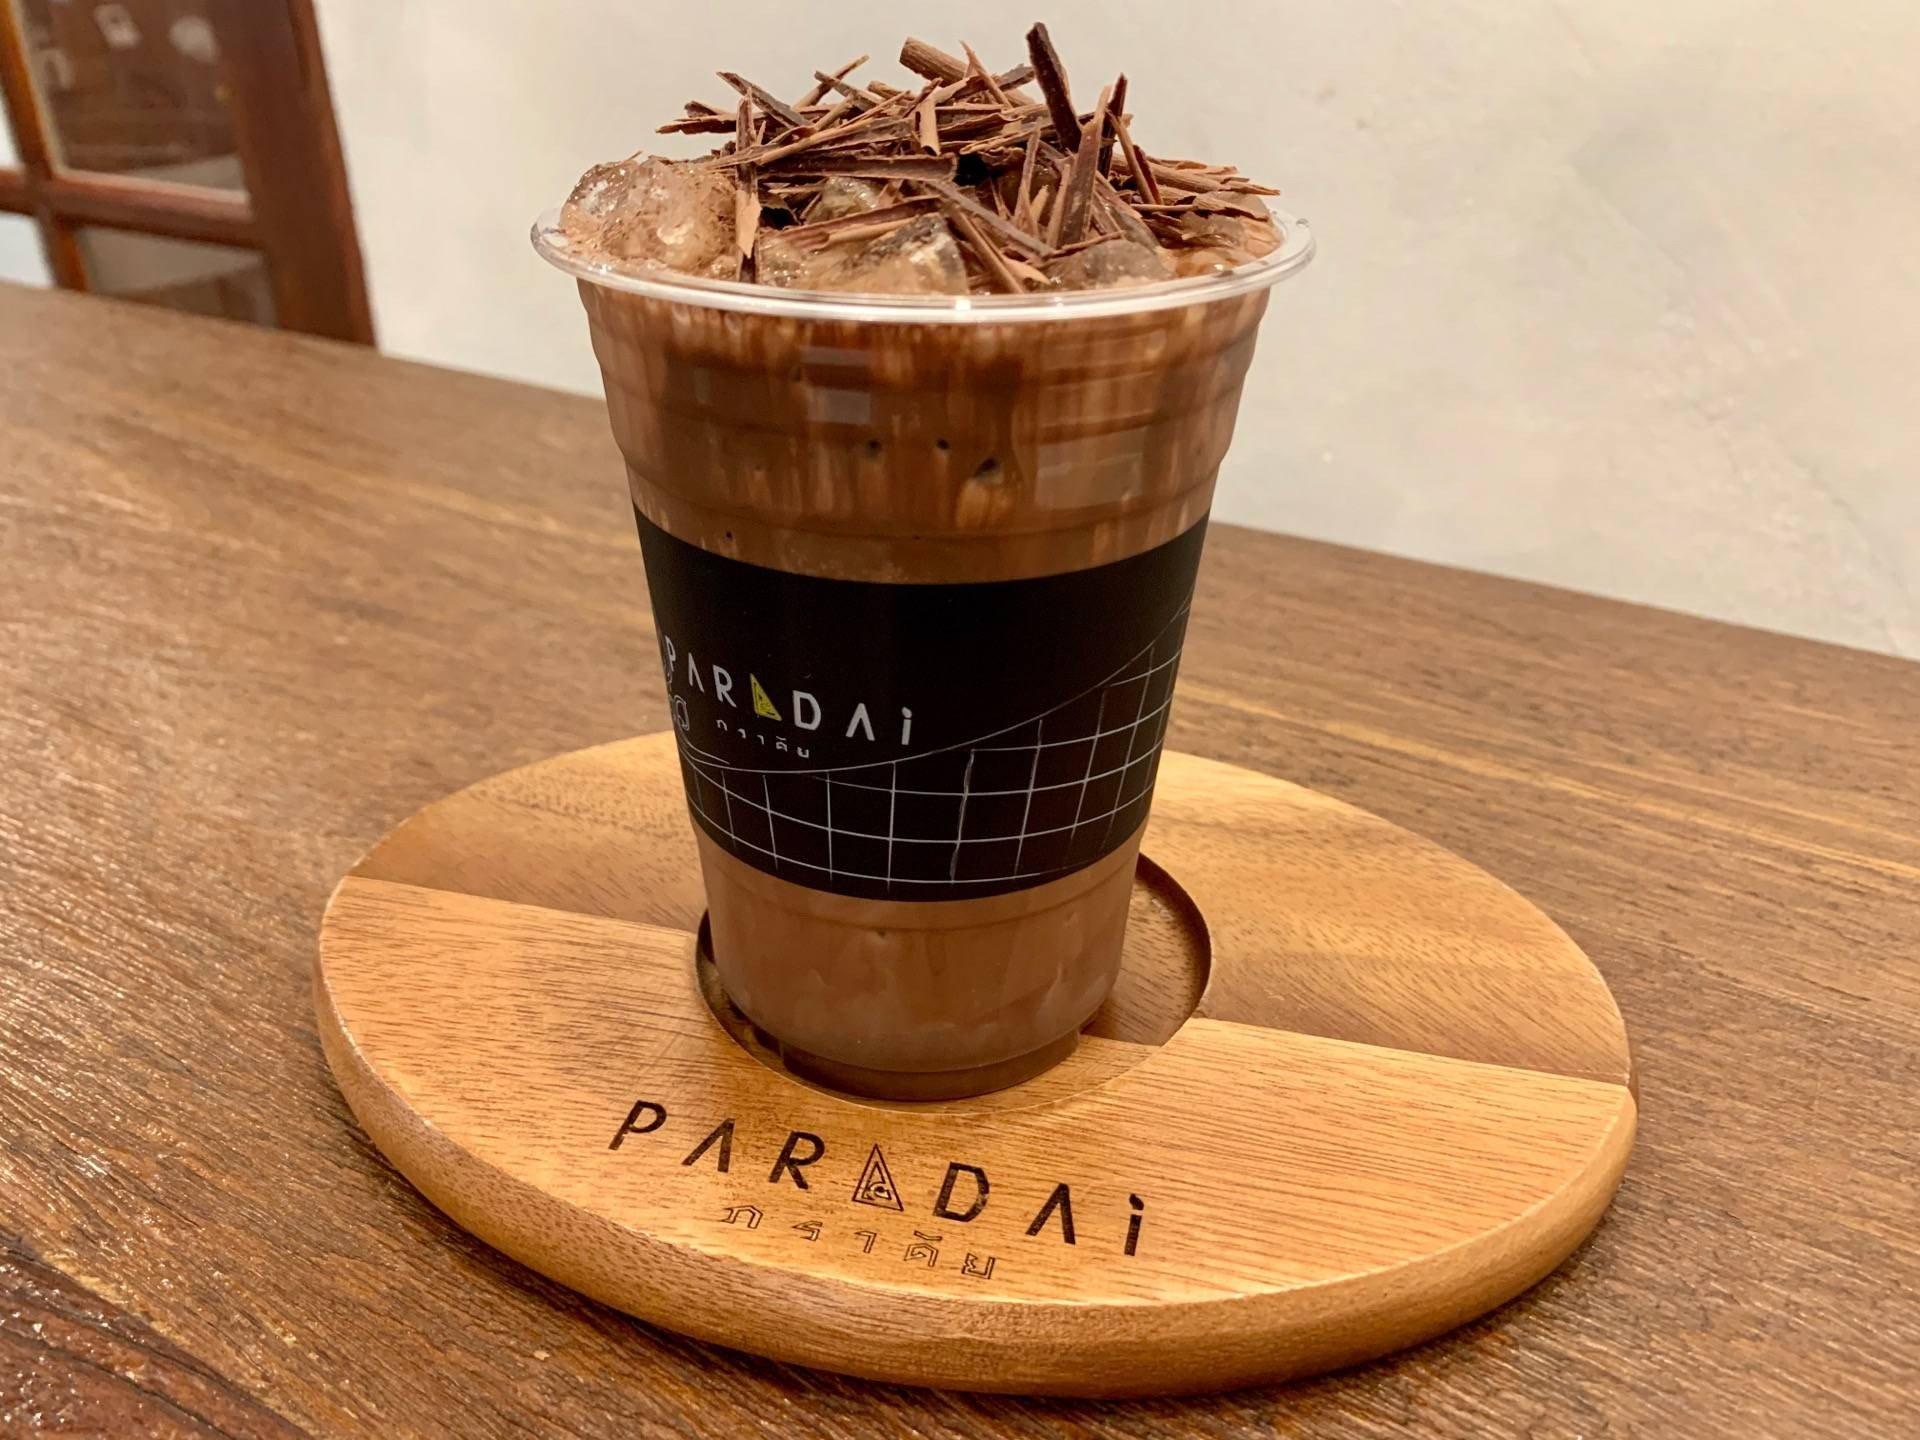 PARADAi Crafted Chocolate & Cafe (สาขา ถ.ตะนาว) ท่าพระจันทร์ - วังบูรพา